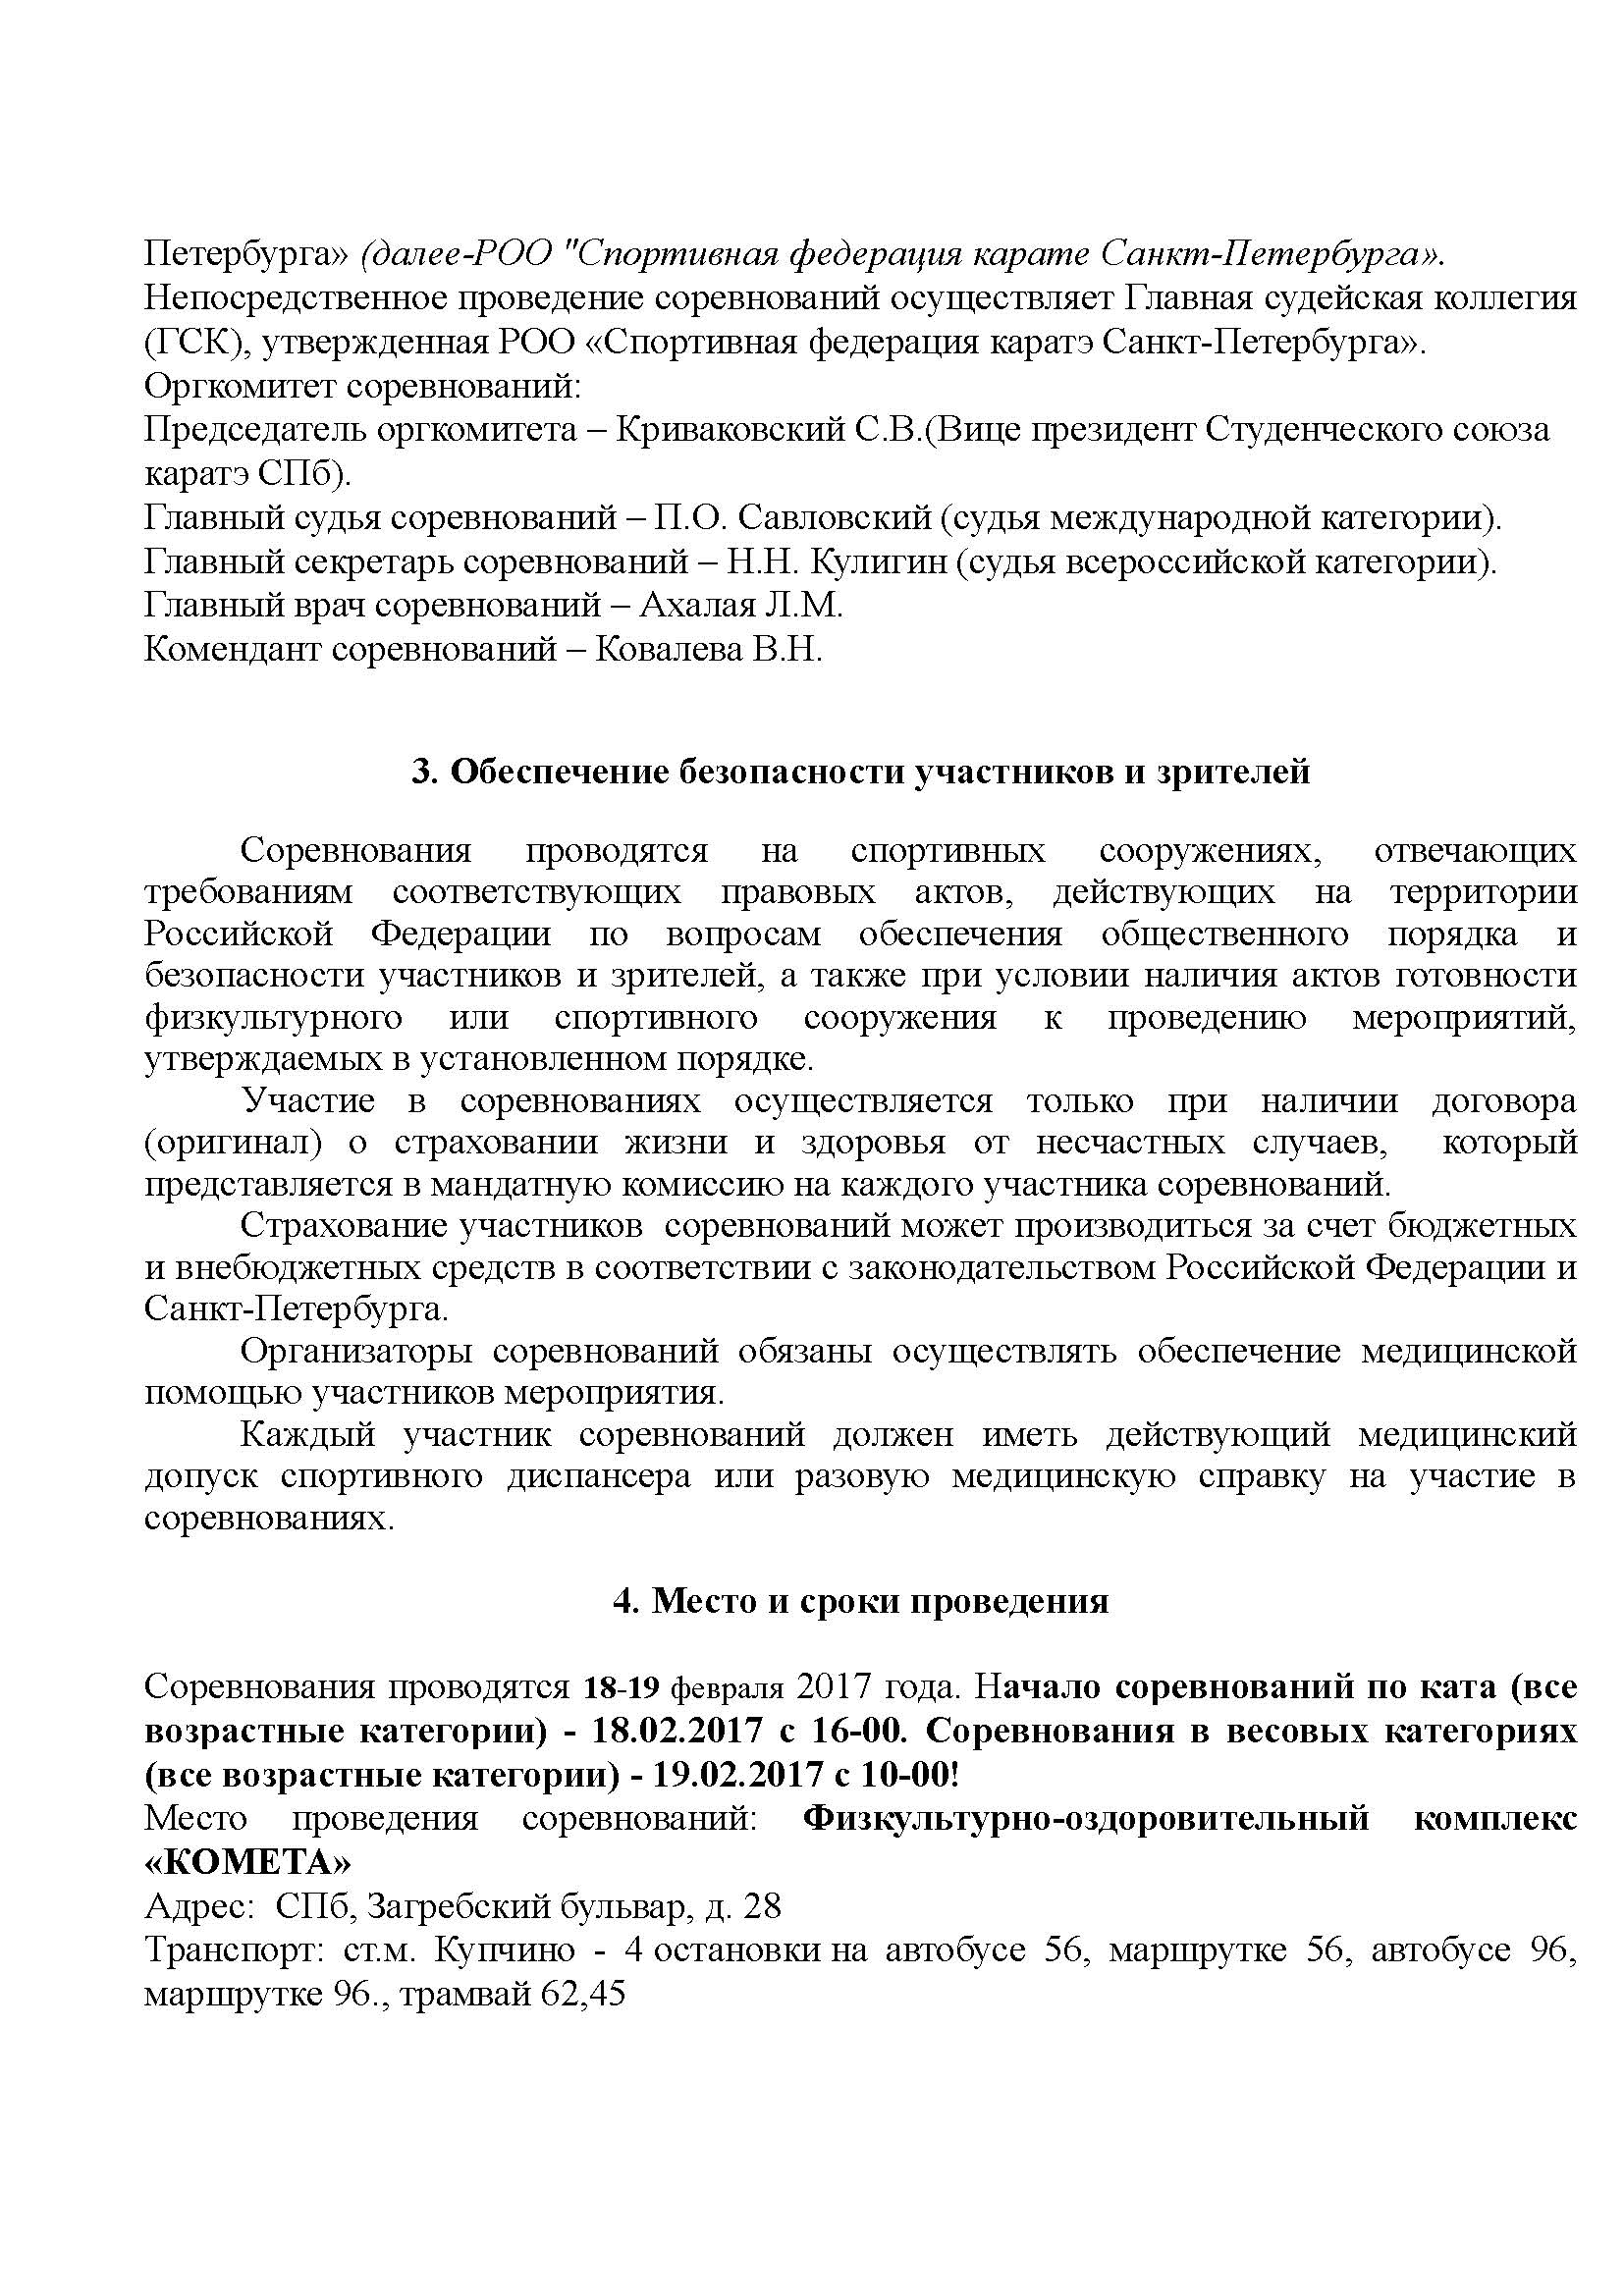 PS-2017-001-ВС_Страница_2